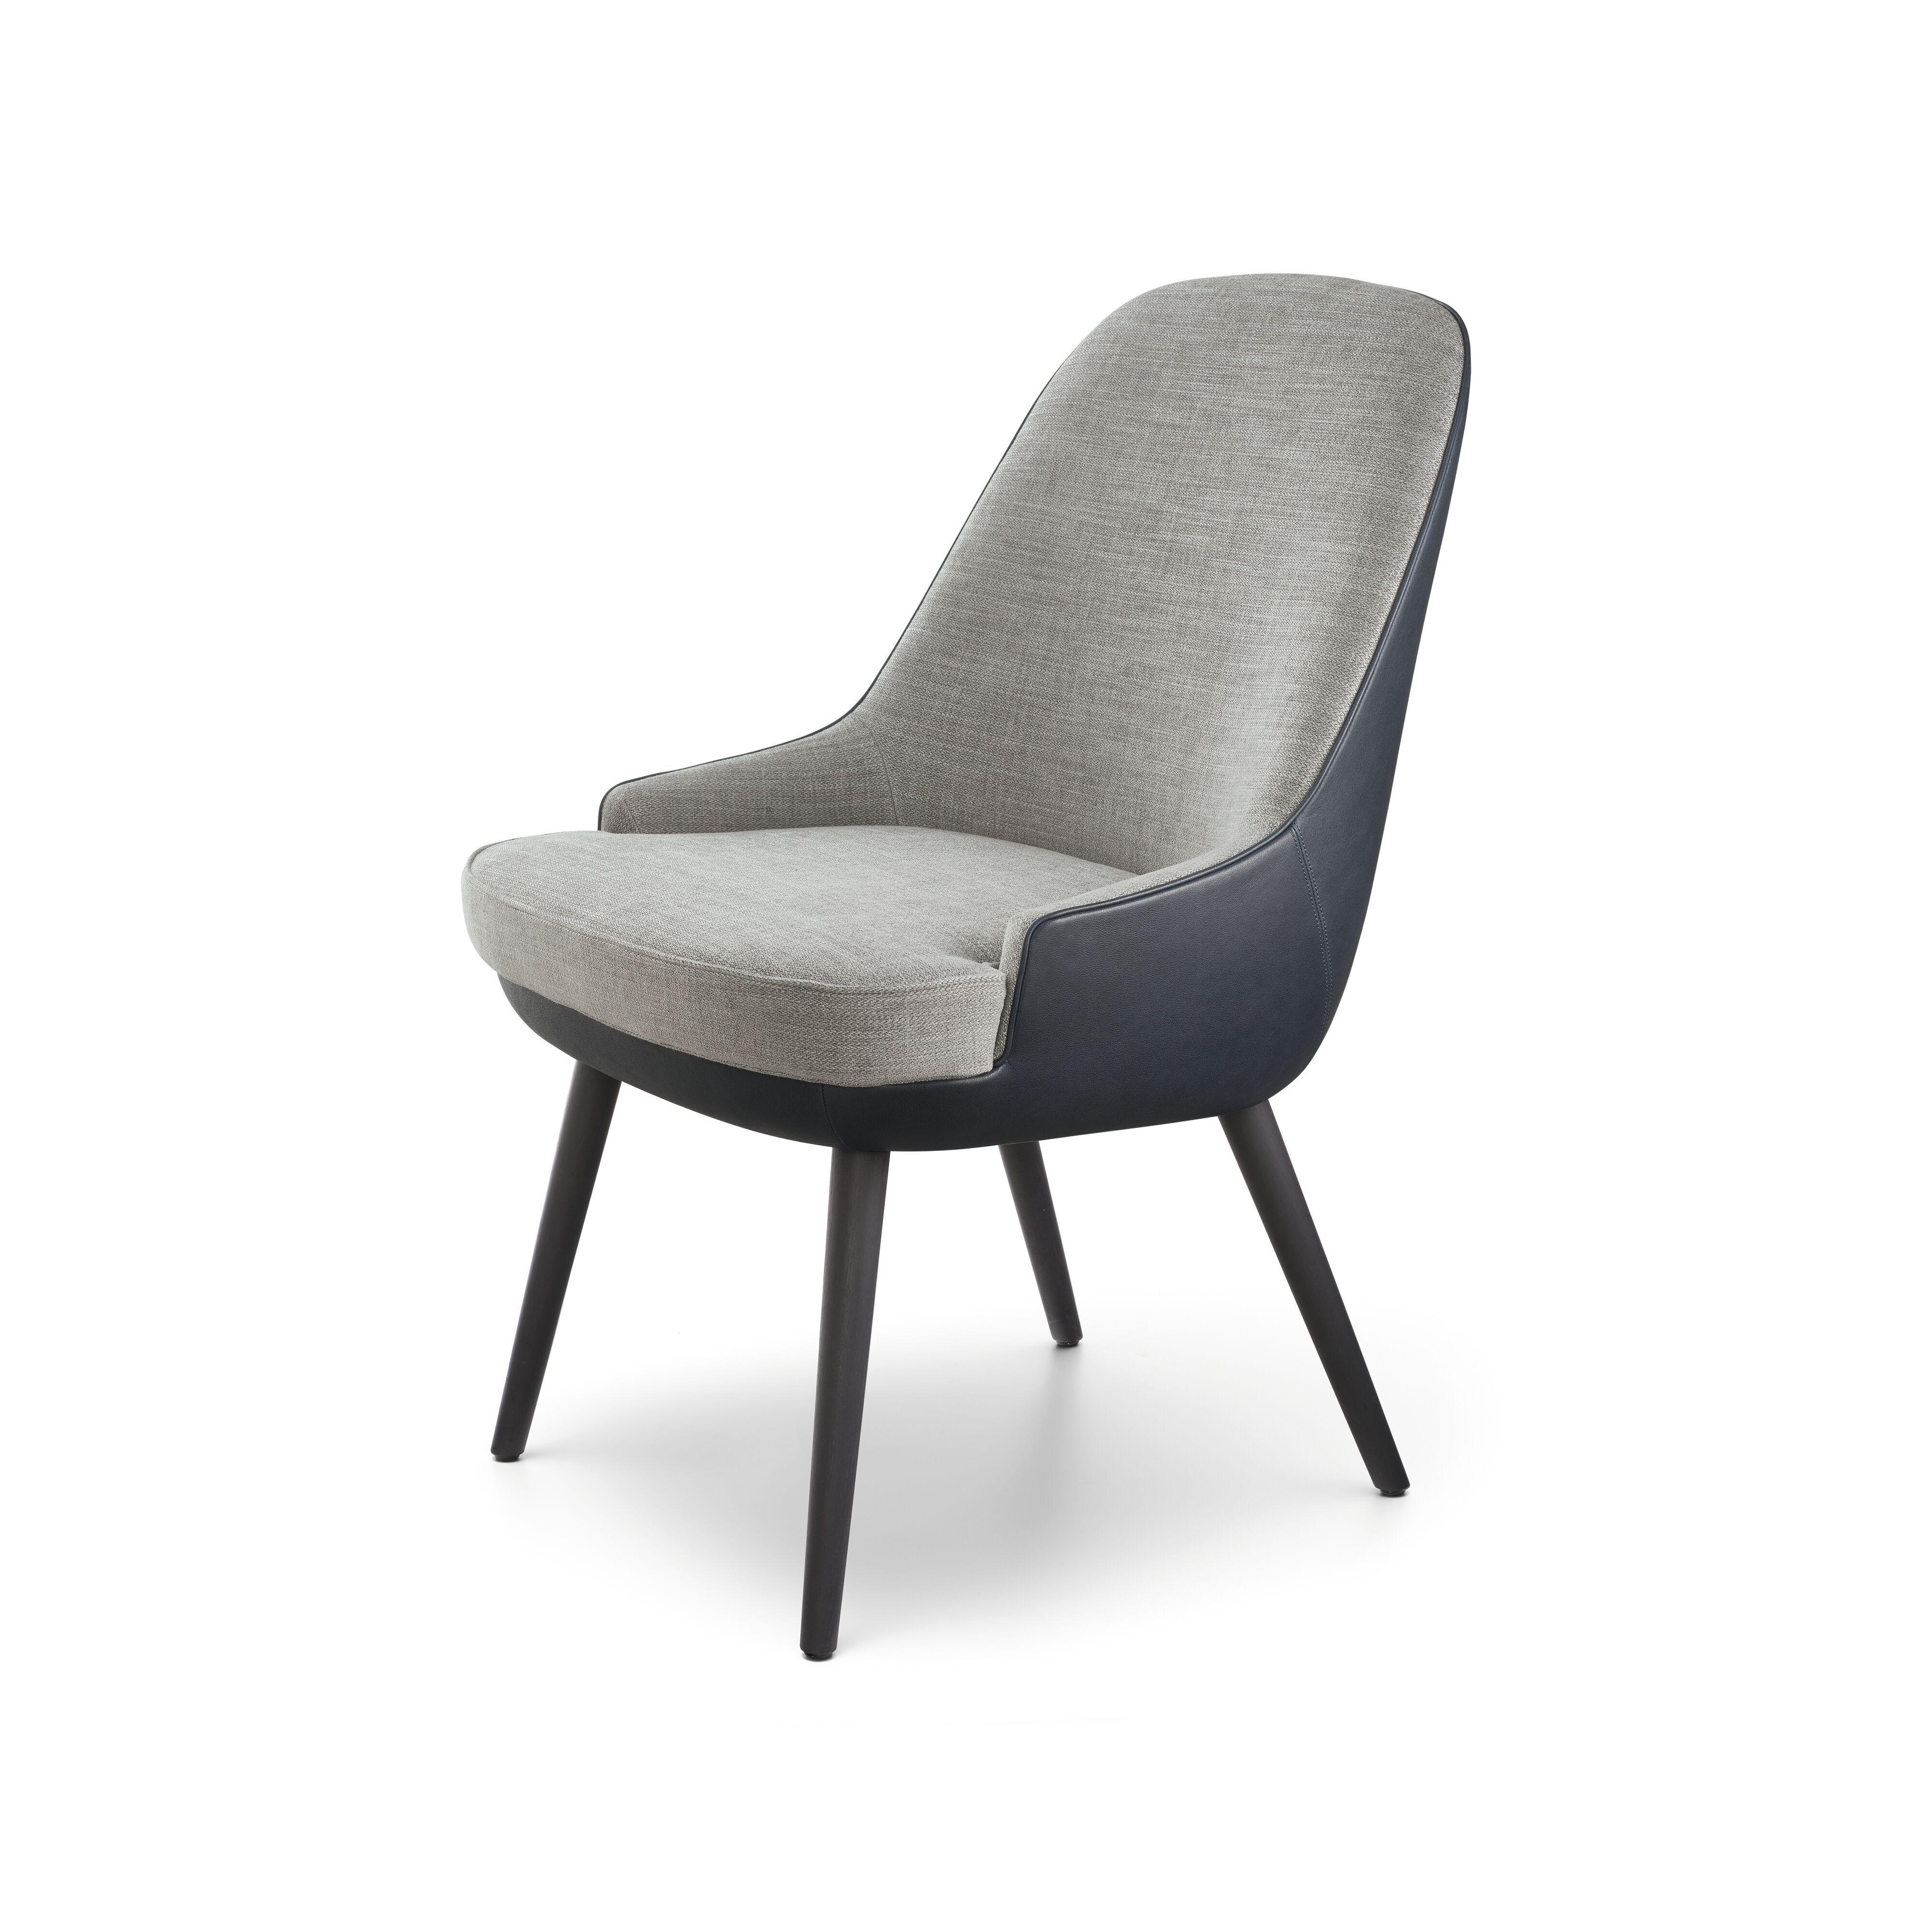 09_WK-375_Chair-Modell-1375-C-0004-H.tif